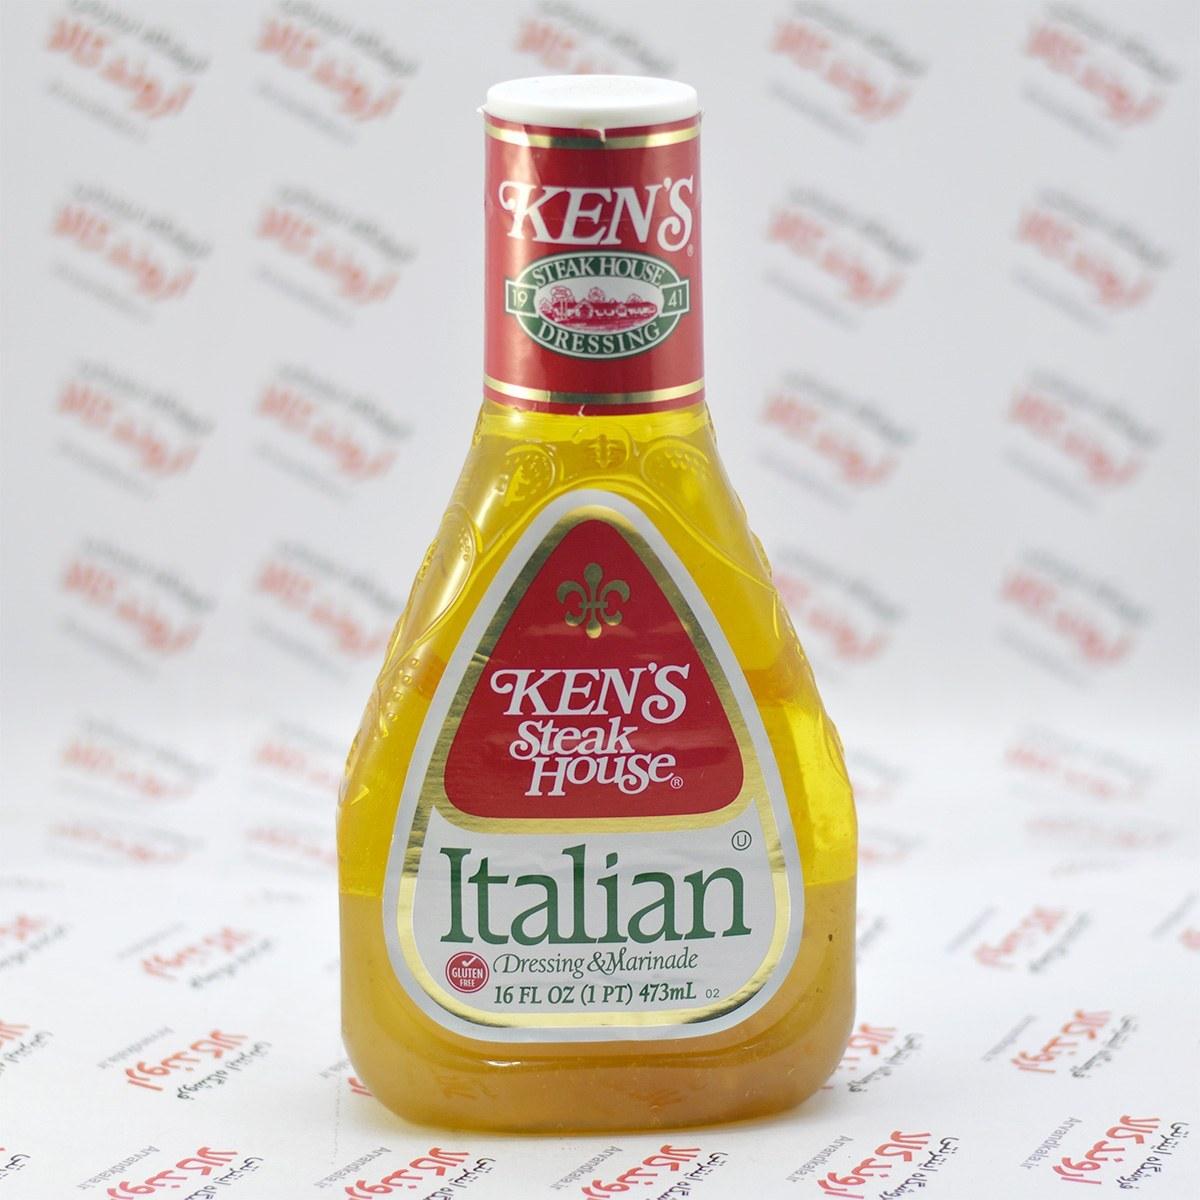 تصویر سس ایتالیایی کنز Ken's مدل Italian